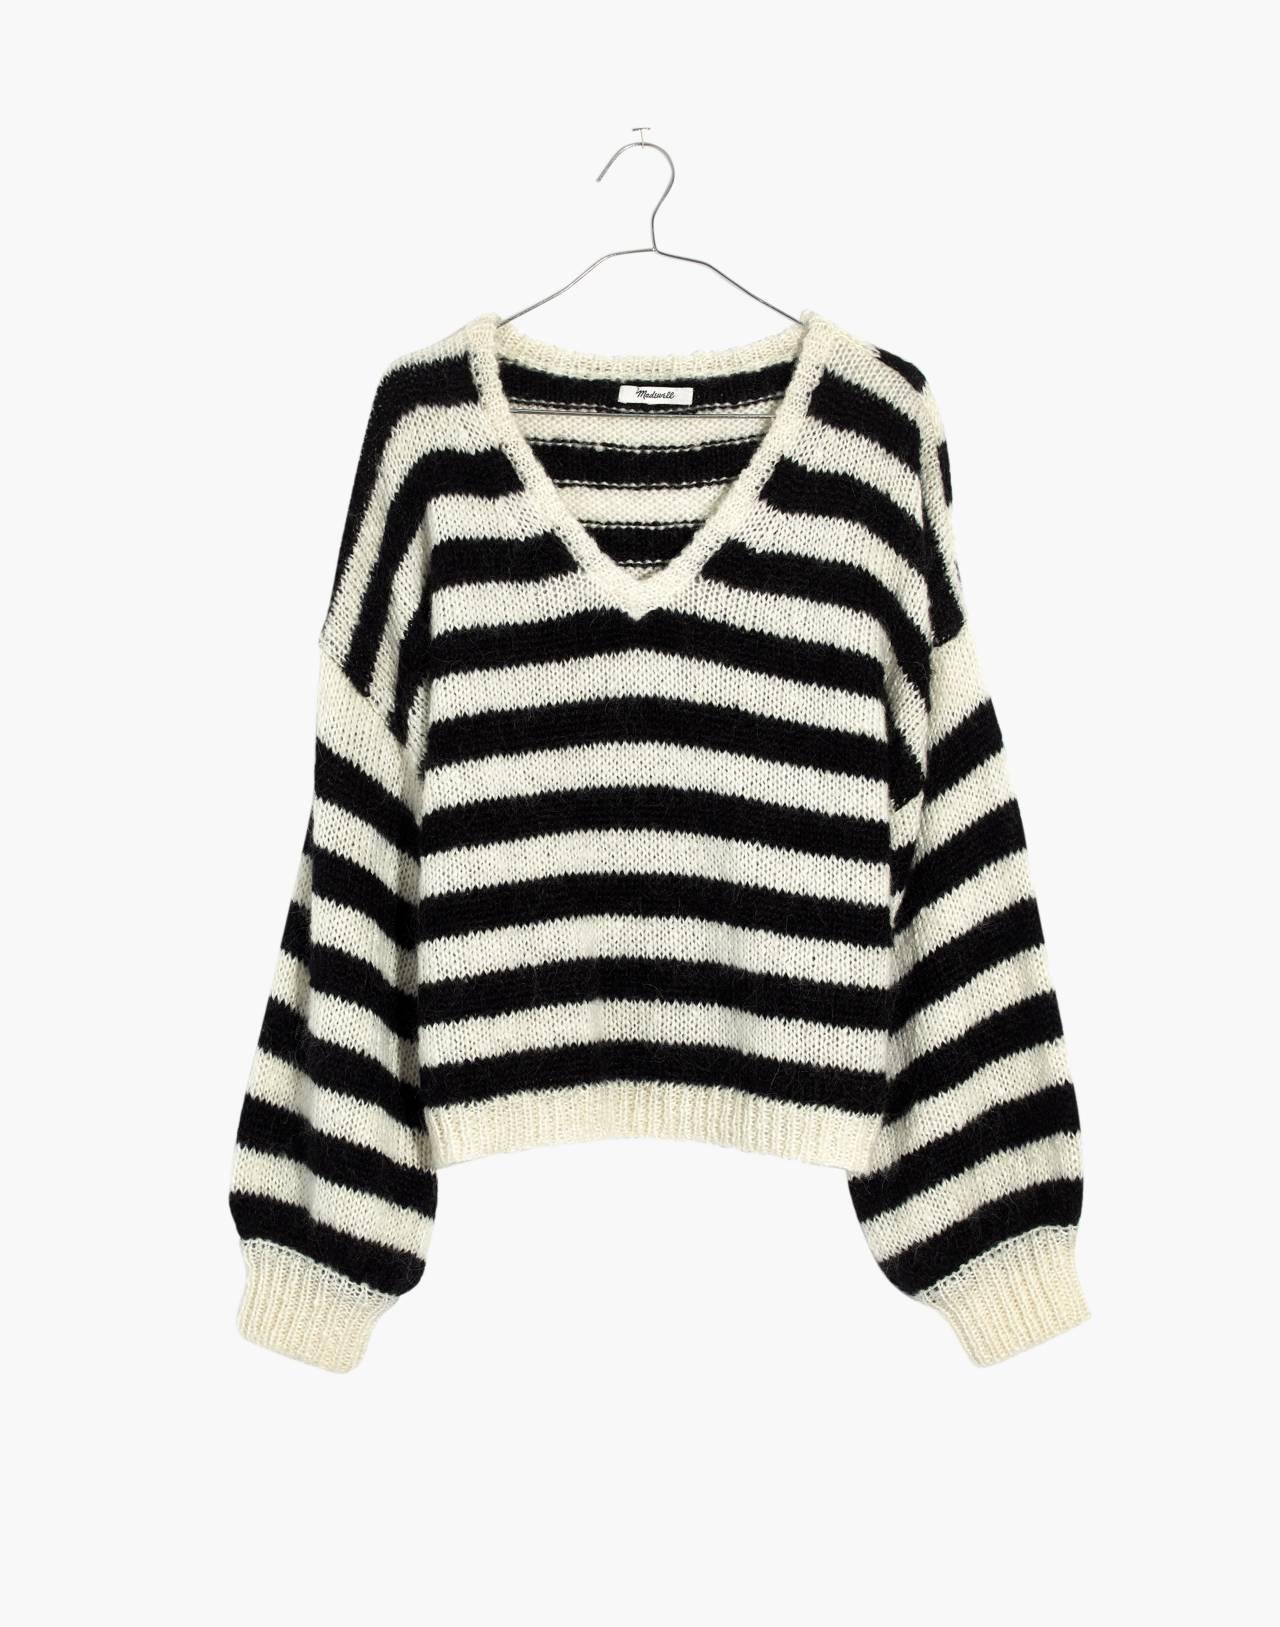 Balloon-Sleeve Pullover Sweater in Stripe in true black image 4